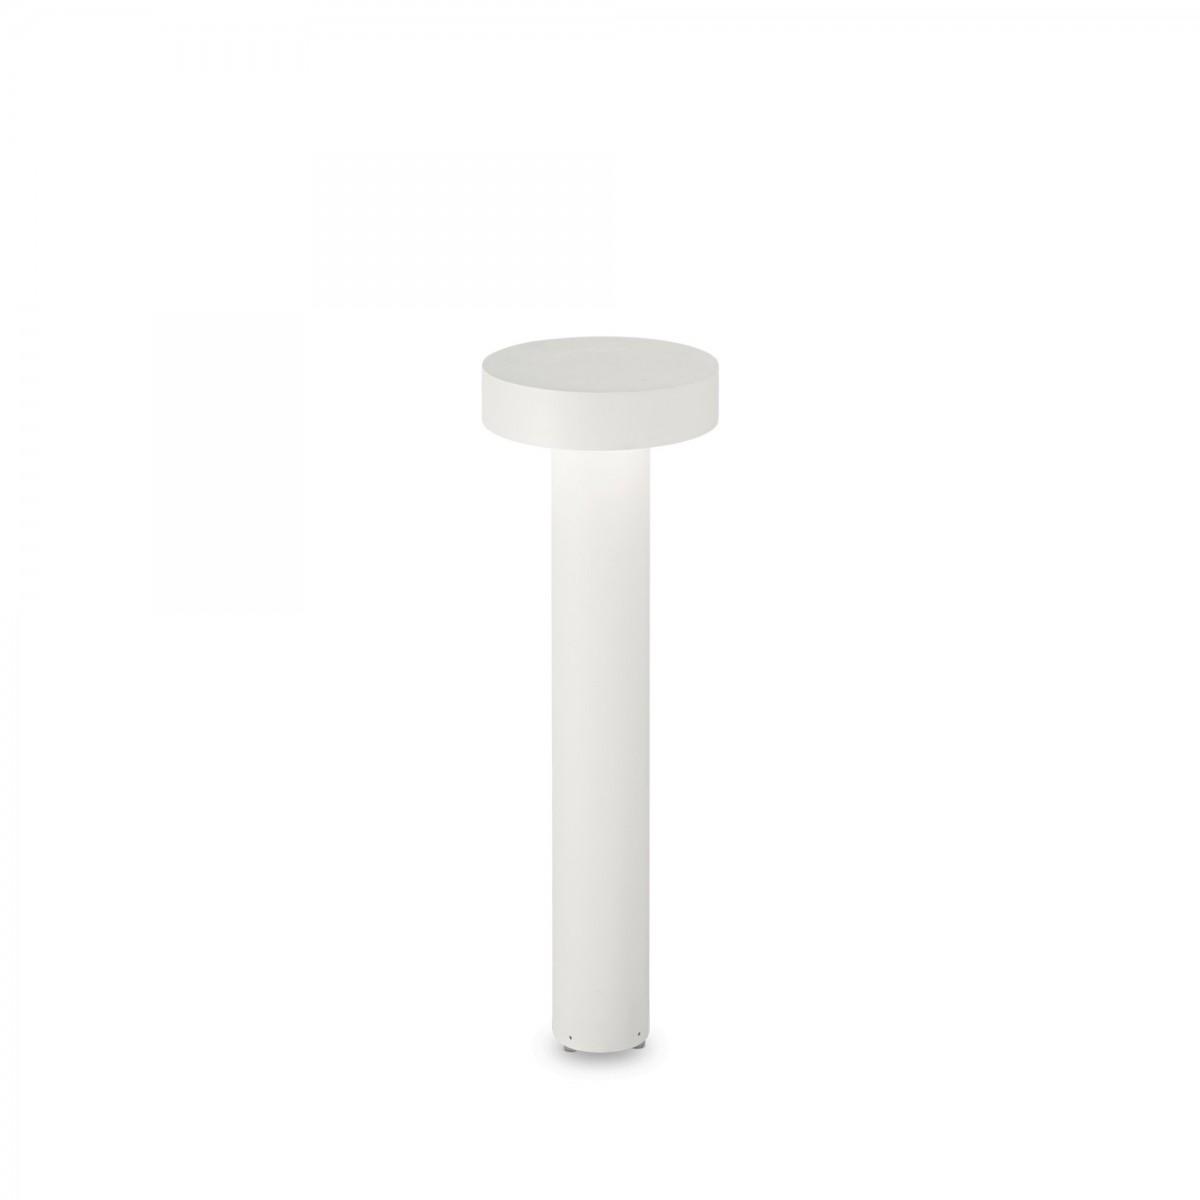 Ideal Lux 153209 venkovní lampa Tesla 4x15W|G9